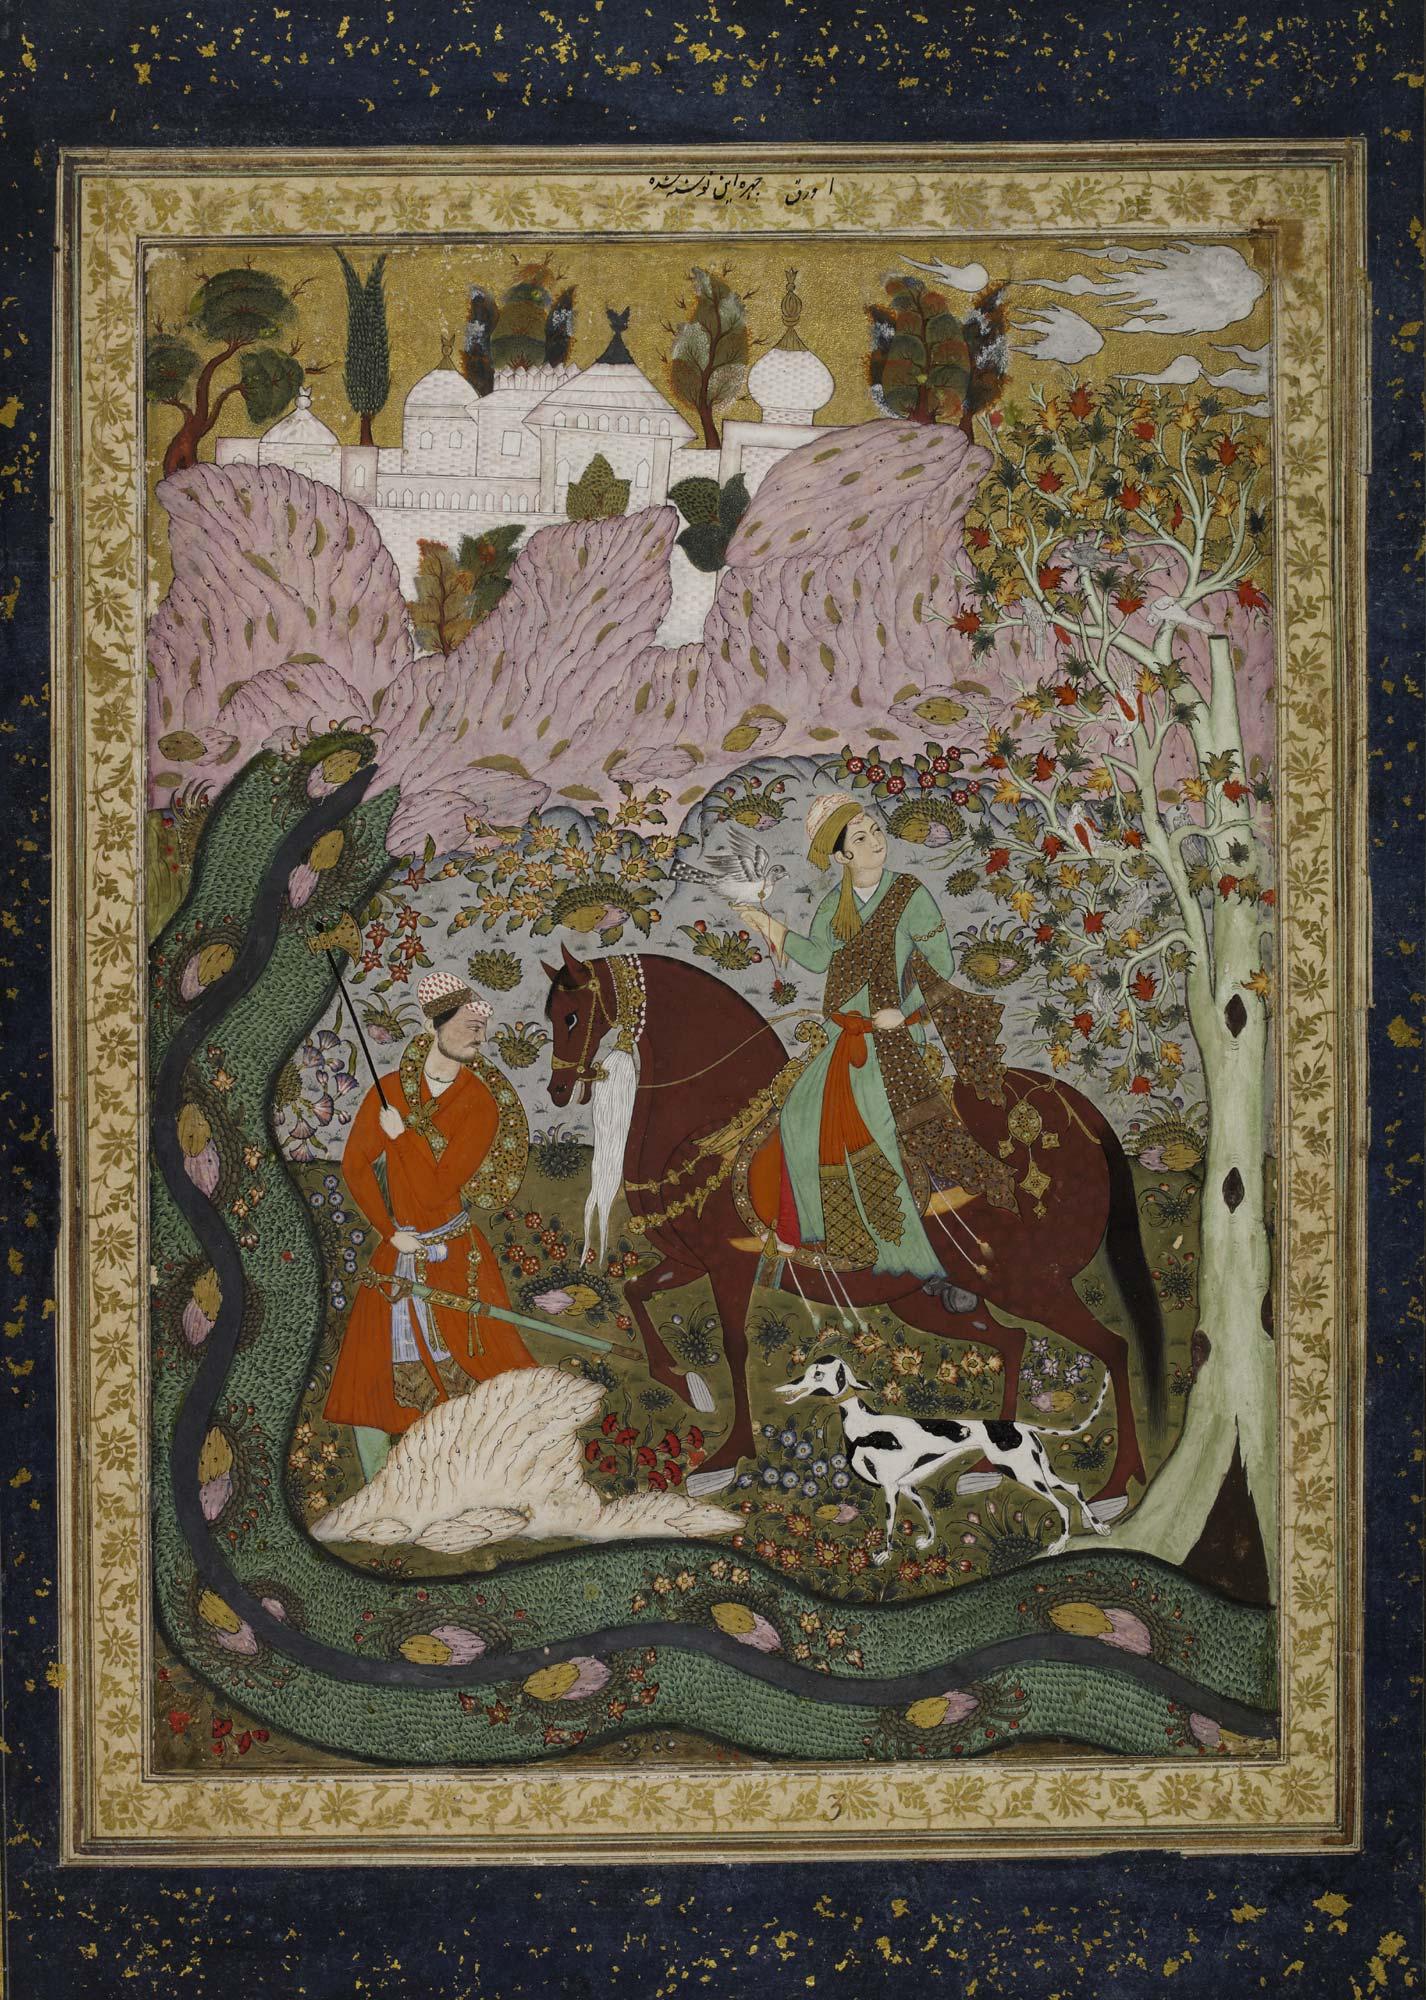 Phulban by Ibn Nishati